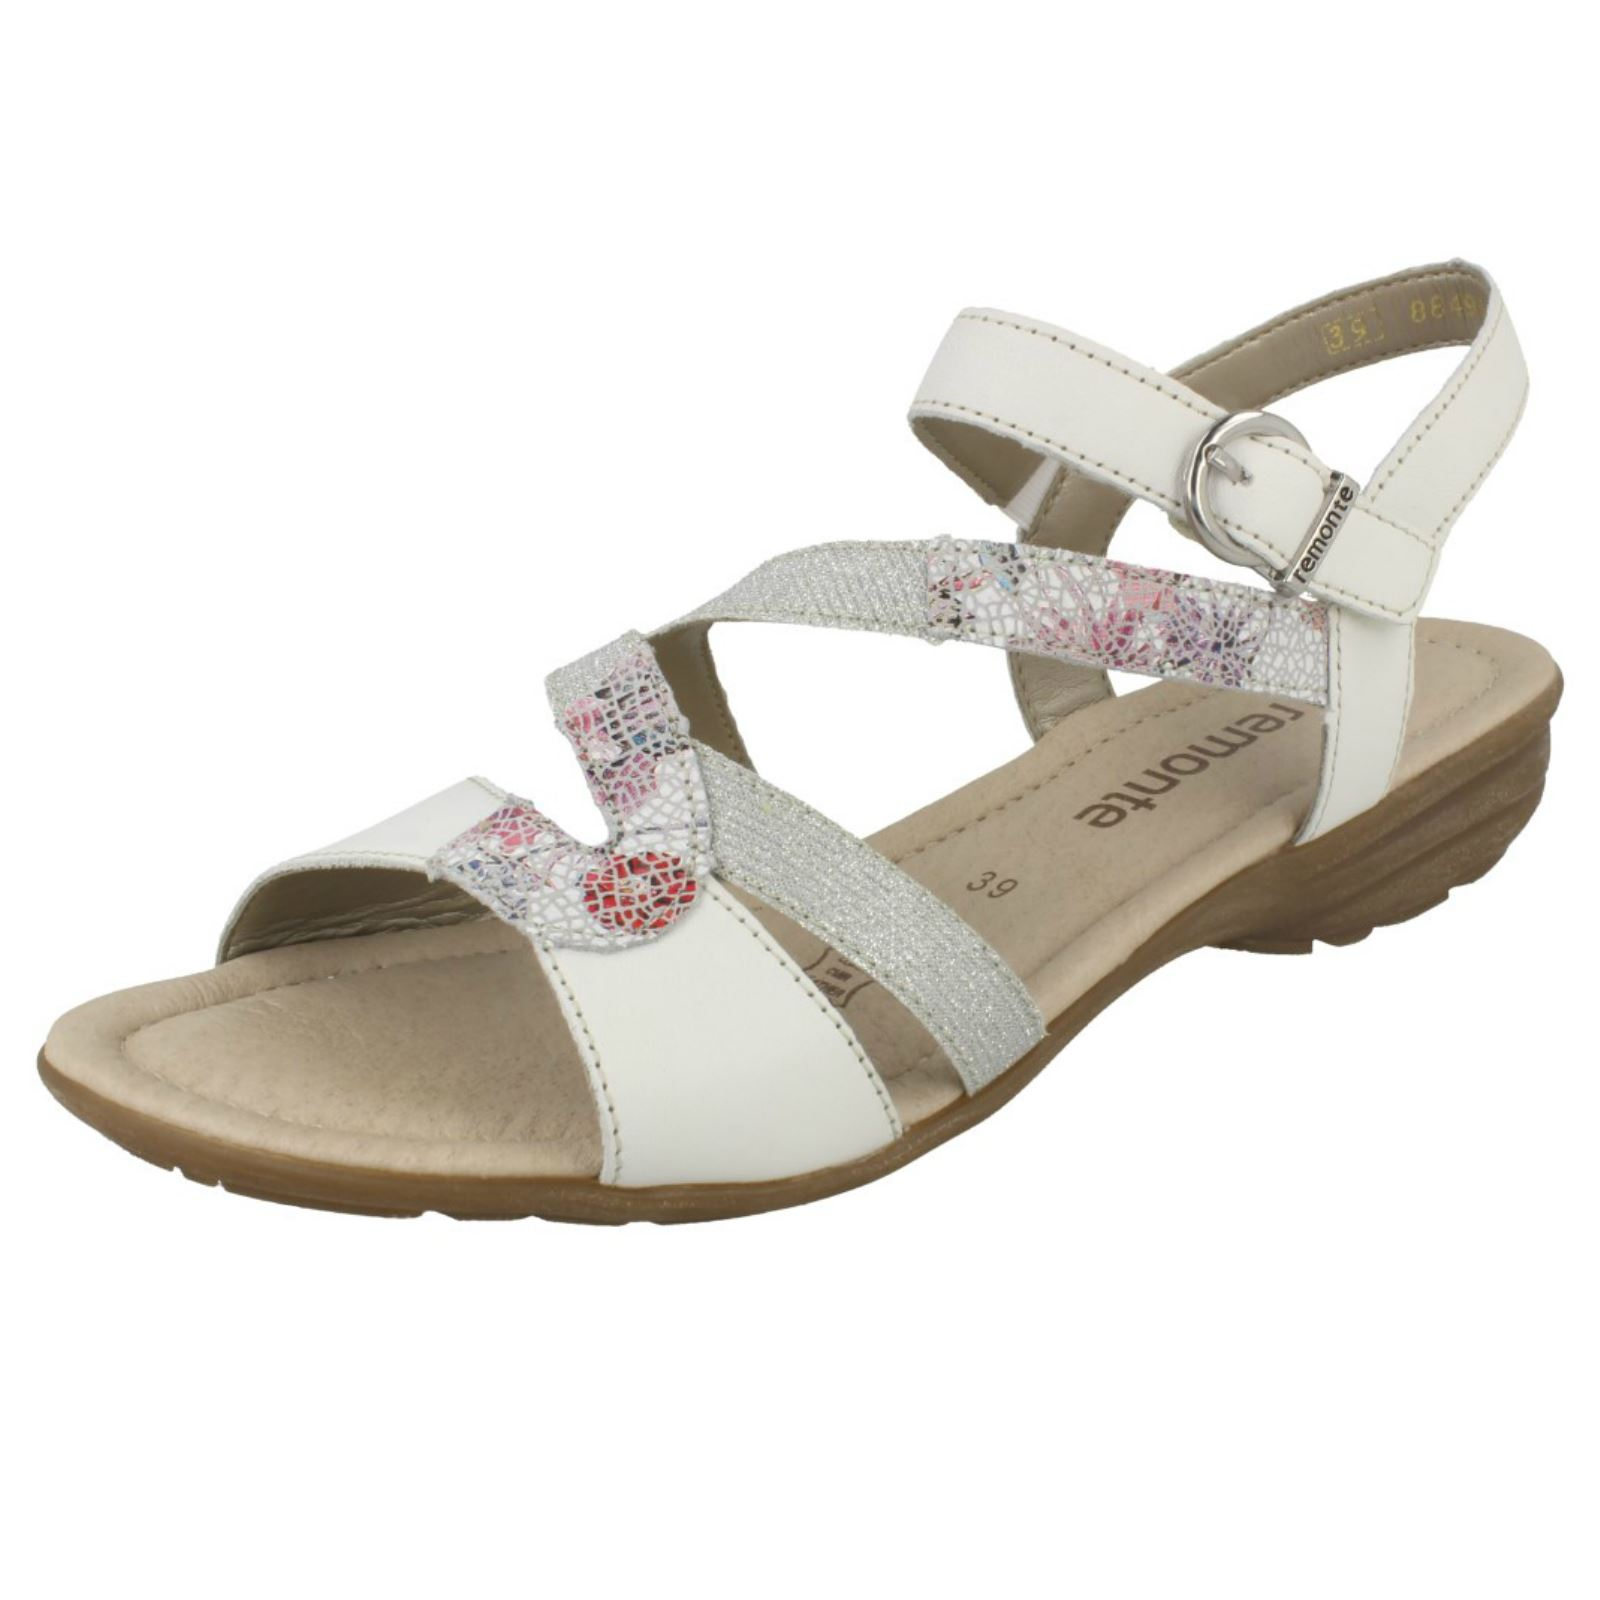 Remonte Dorndorf Sandals & Beach Shoes for Women for sale | eBay